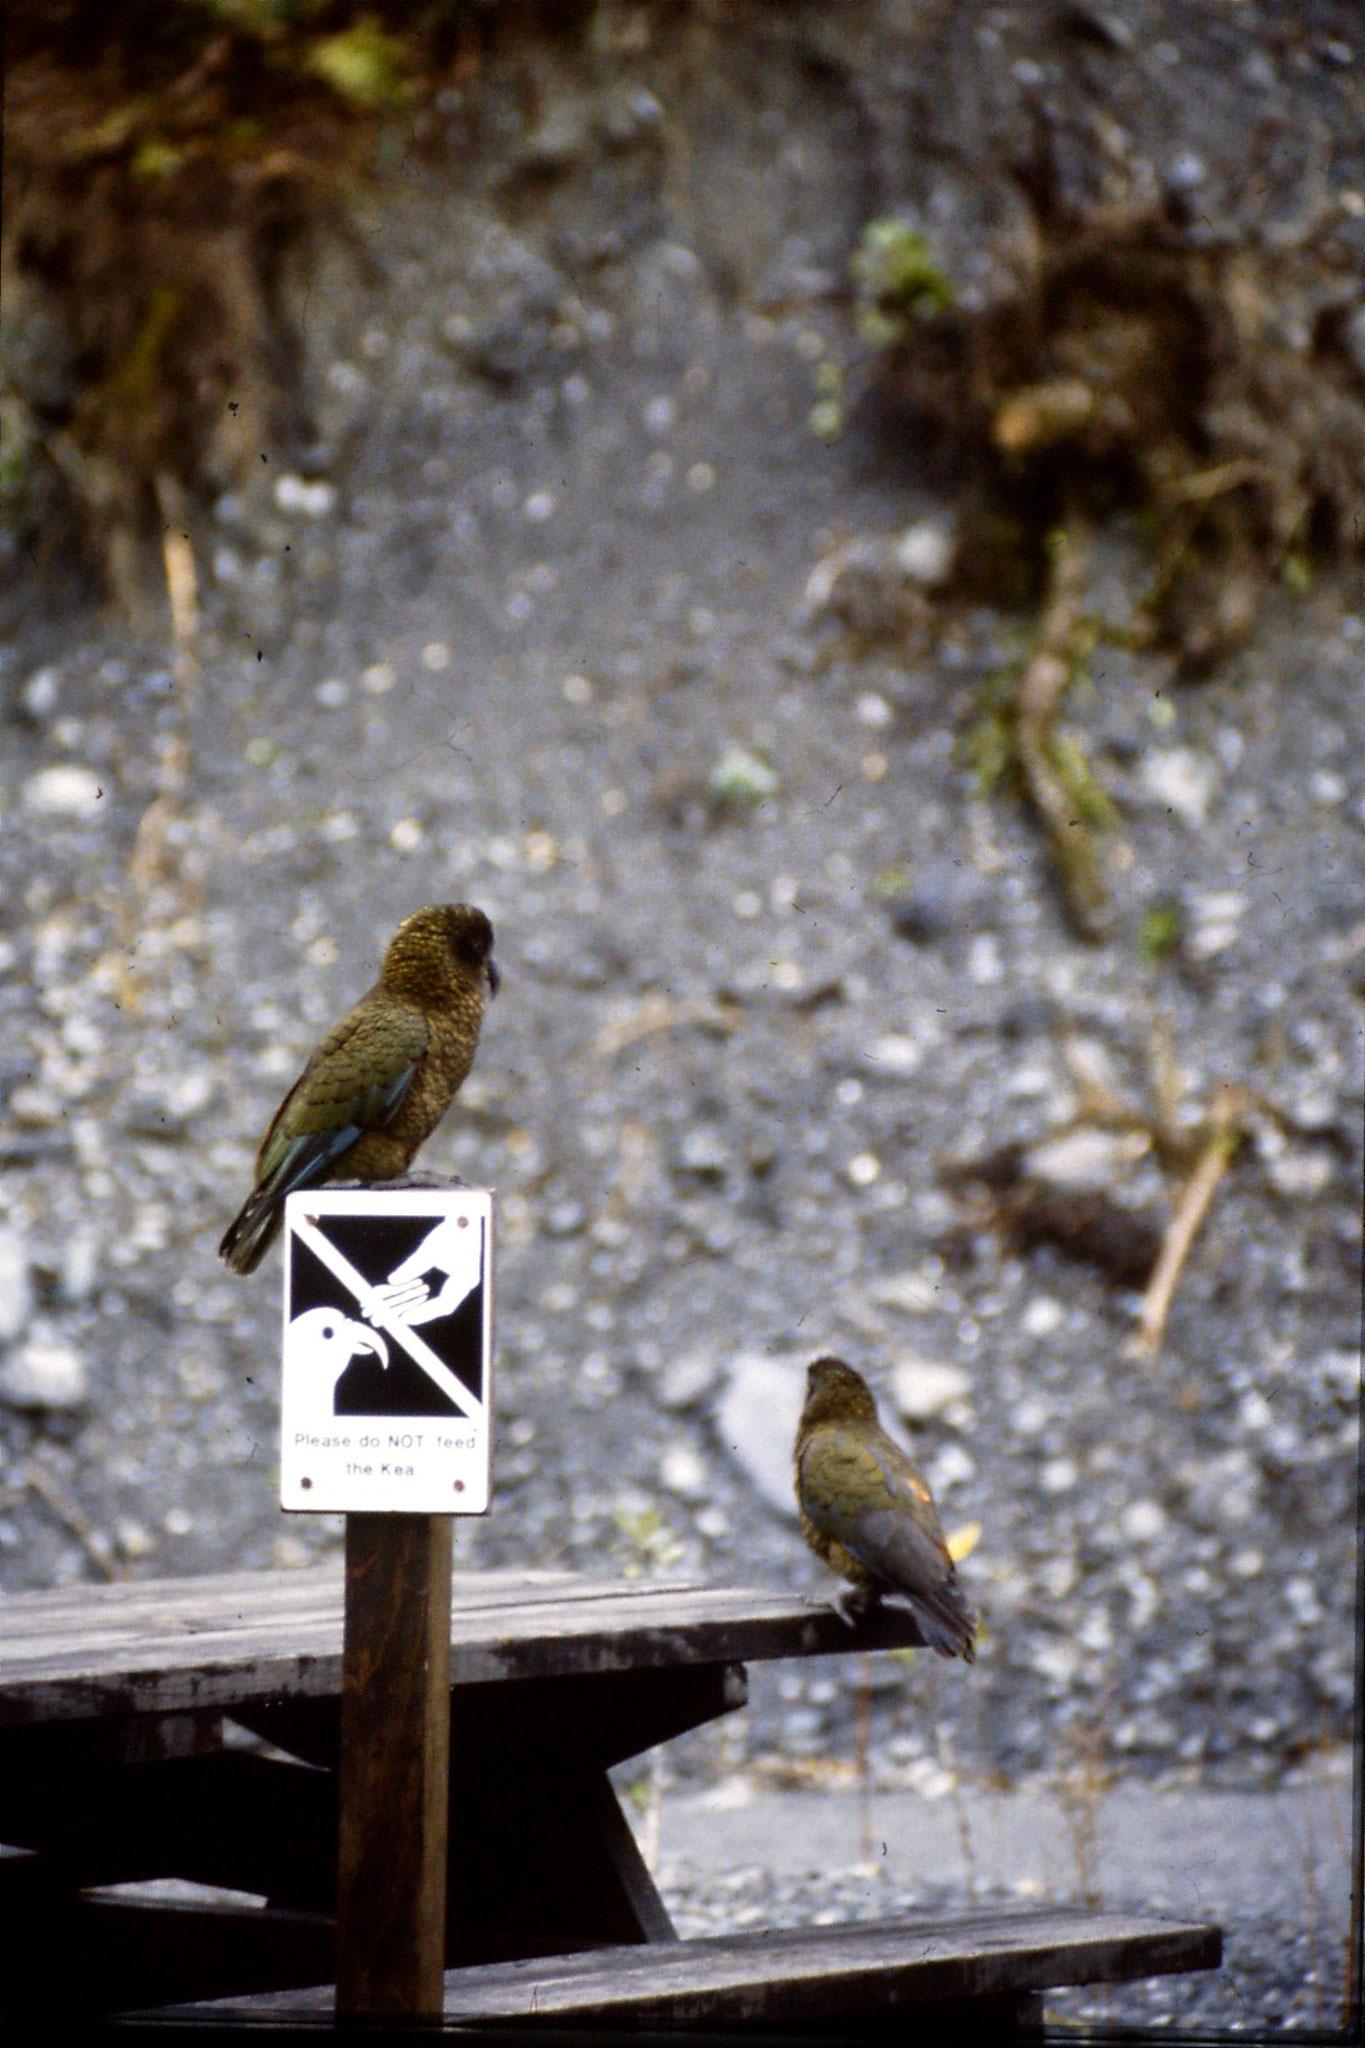 22/8/1990: 33: Keas at Franz Joseph Glacier